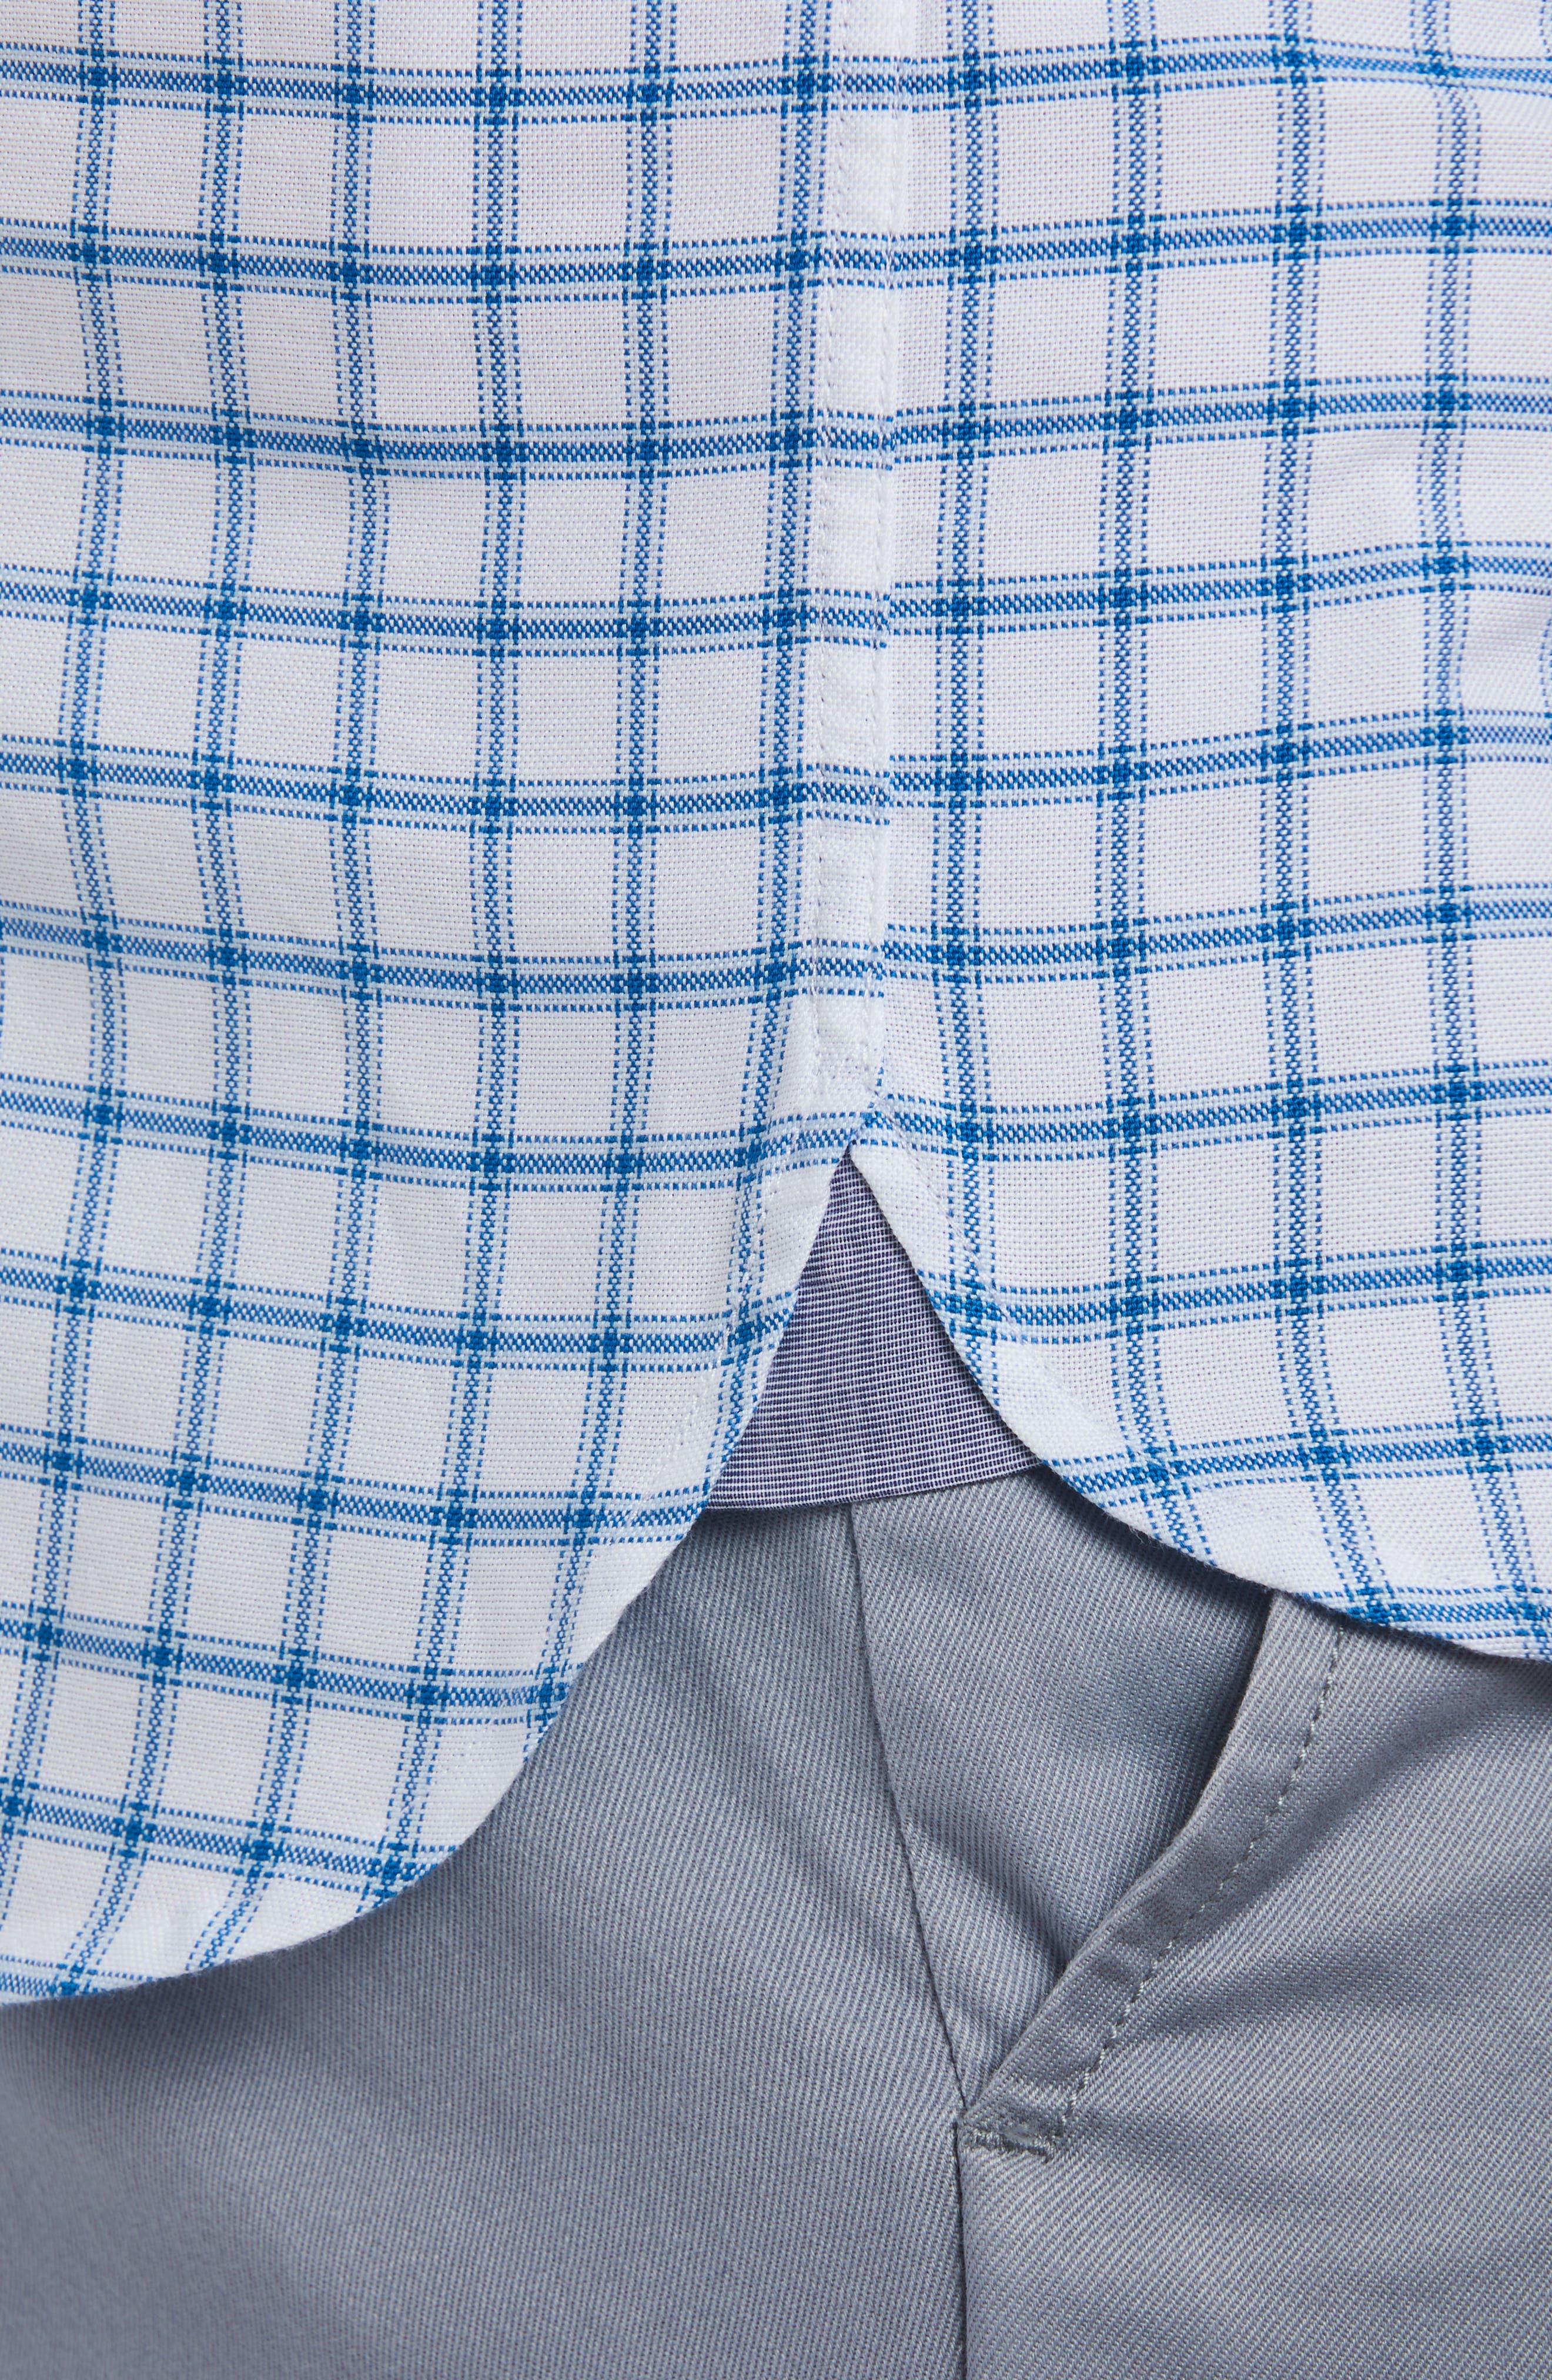 Alternate Image 2  - Lacoste Slim Fit Grid Cotton Sport Shirt